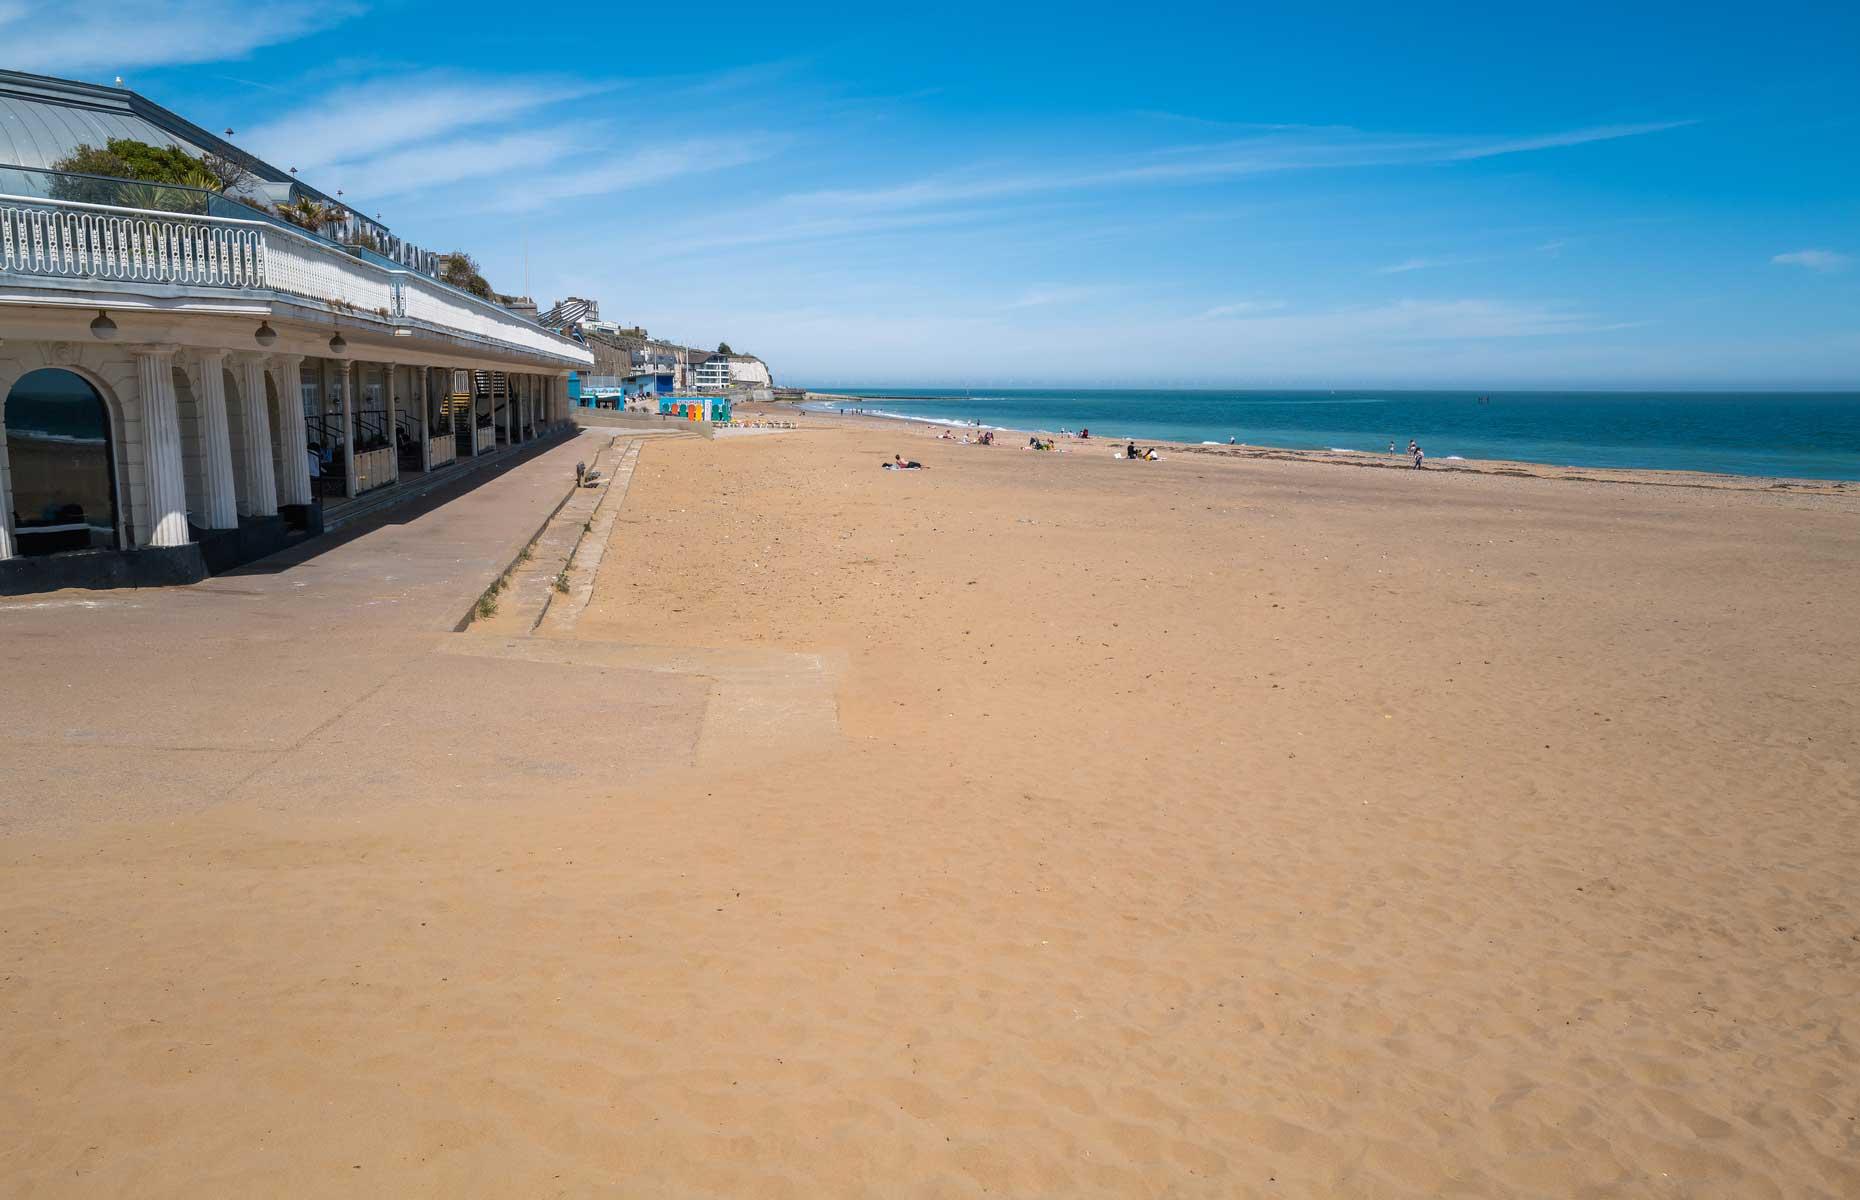 Ramsgate beach (Image: Christine Bird/Shutterstock)